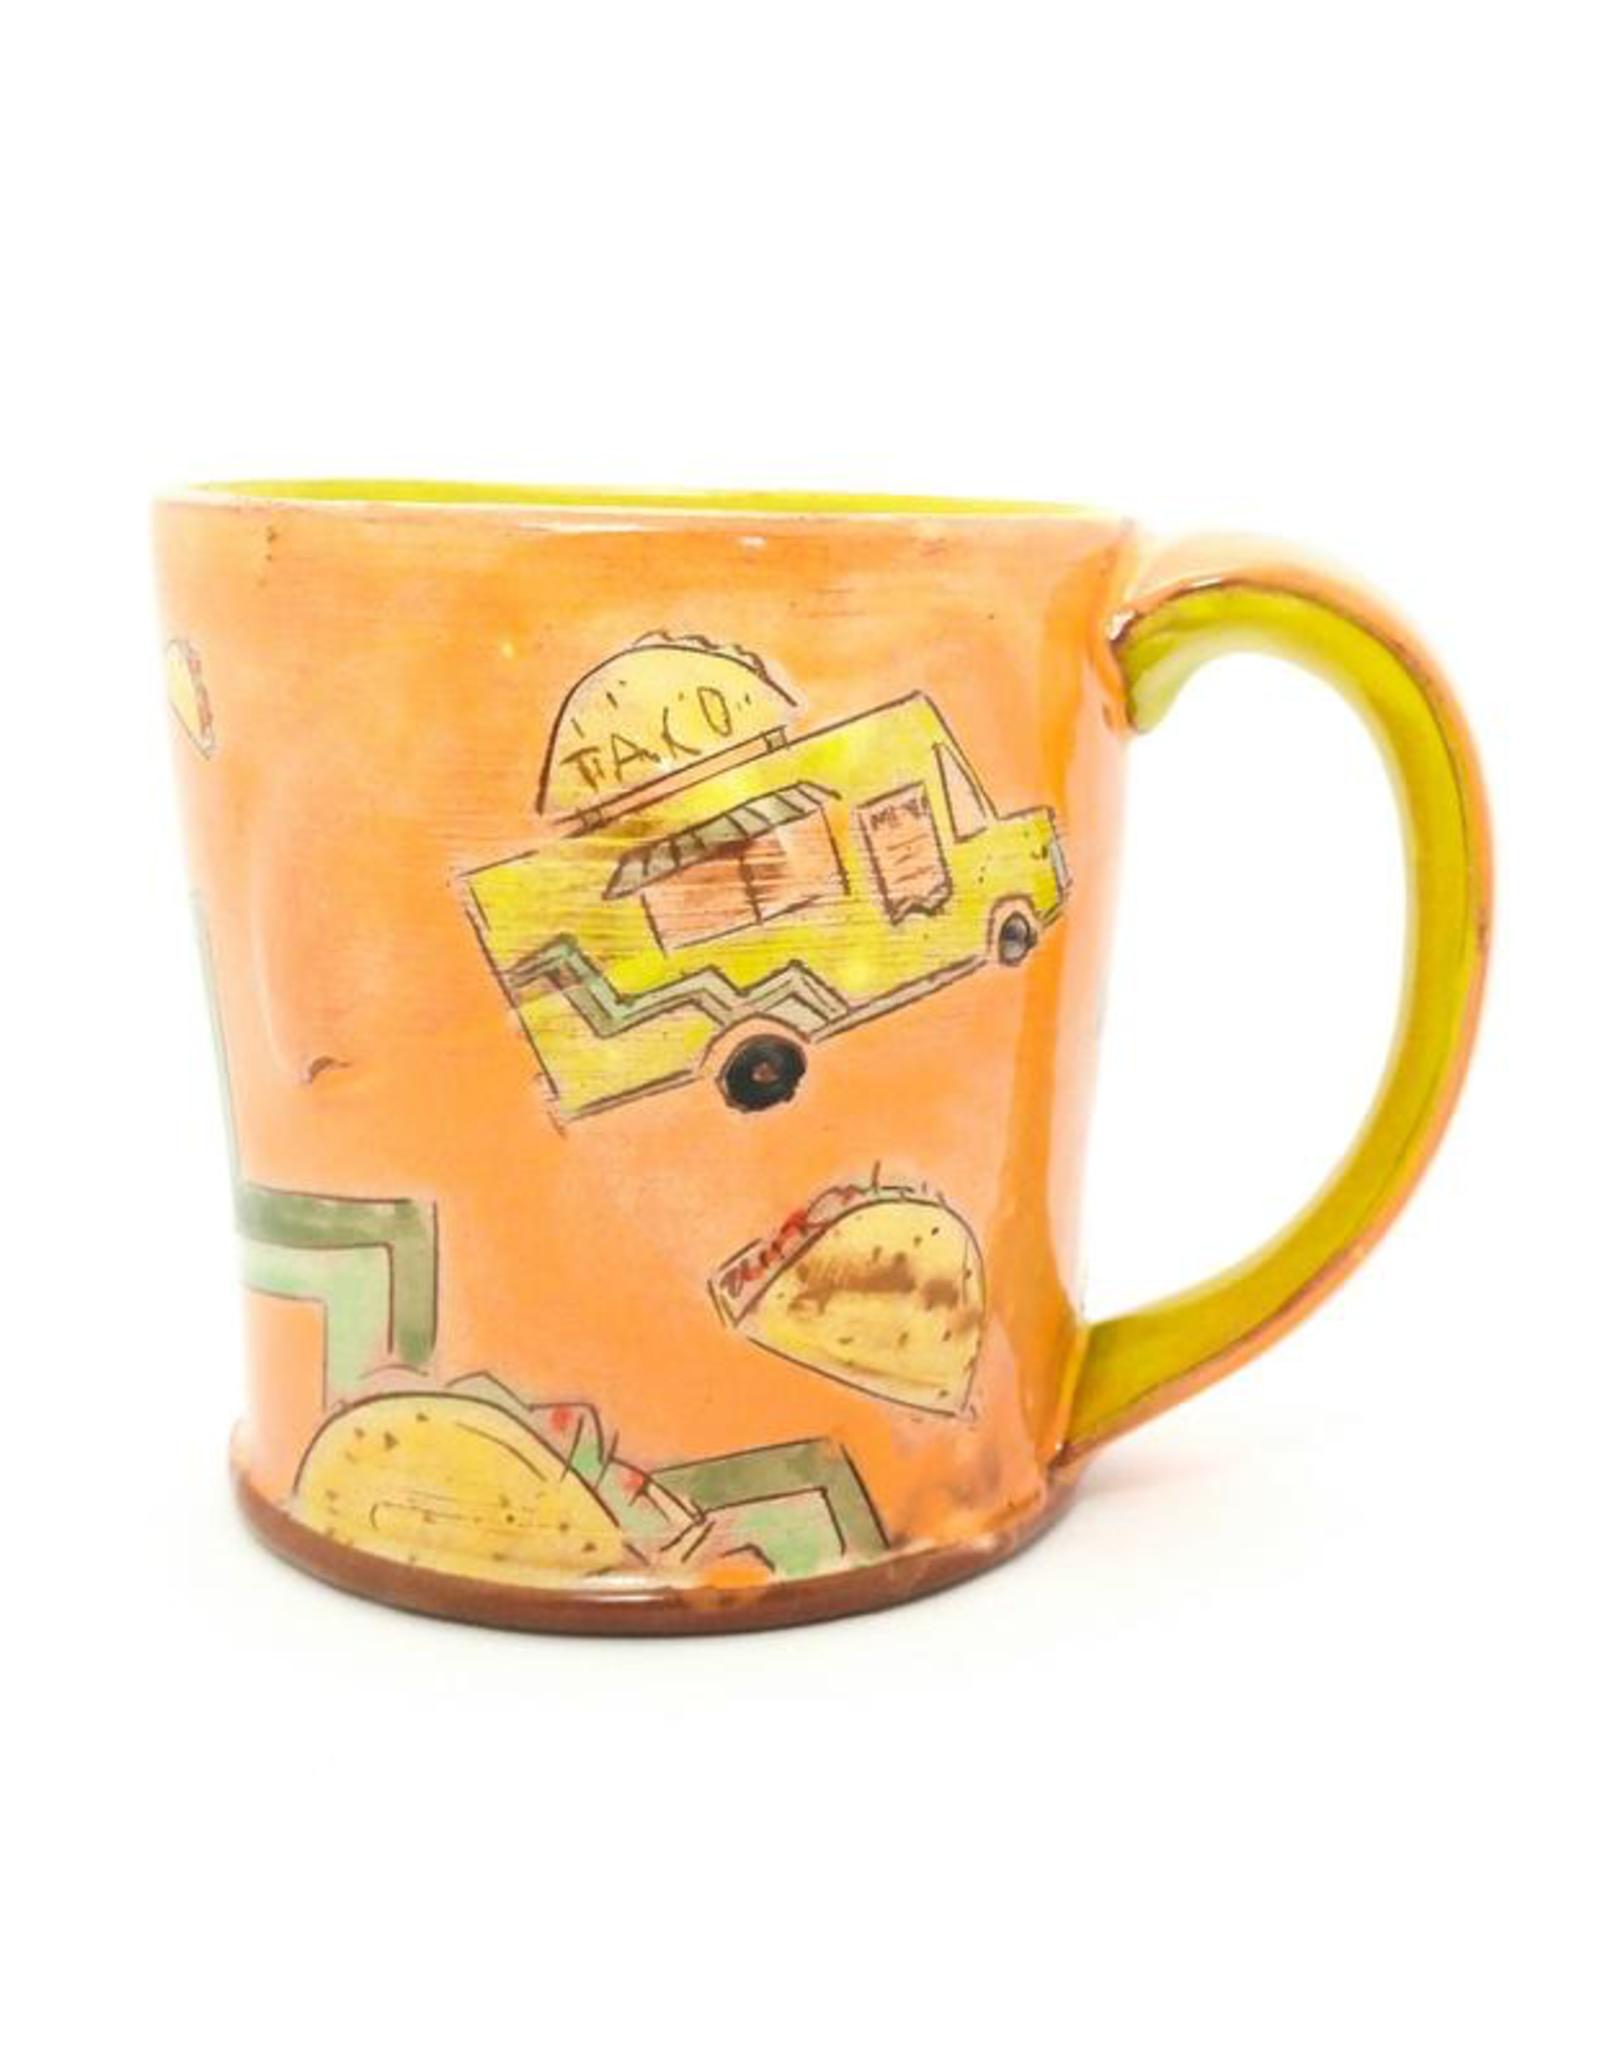 Taco Truck Mug - Assorted